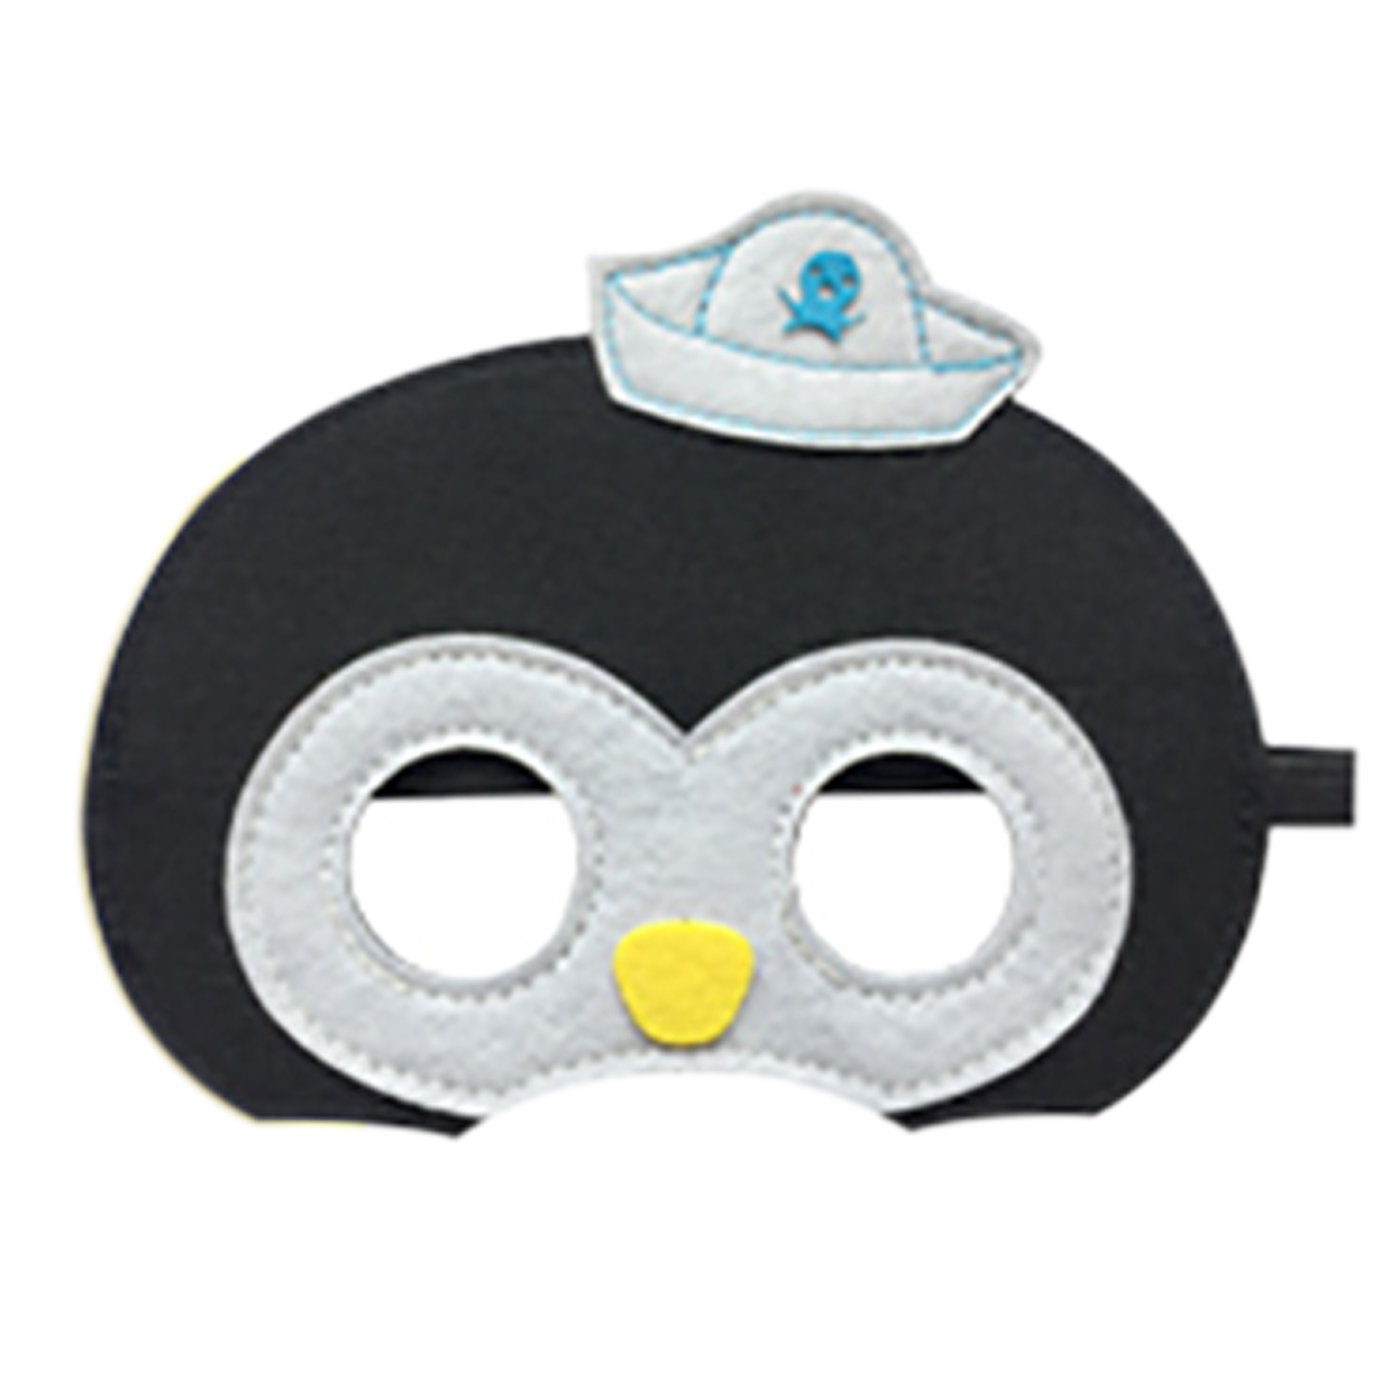 Octonauts Peso Dress Up Cape and Mask Set